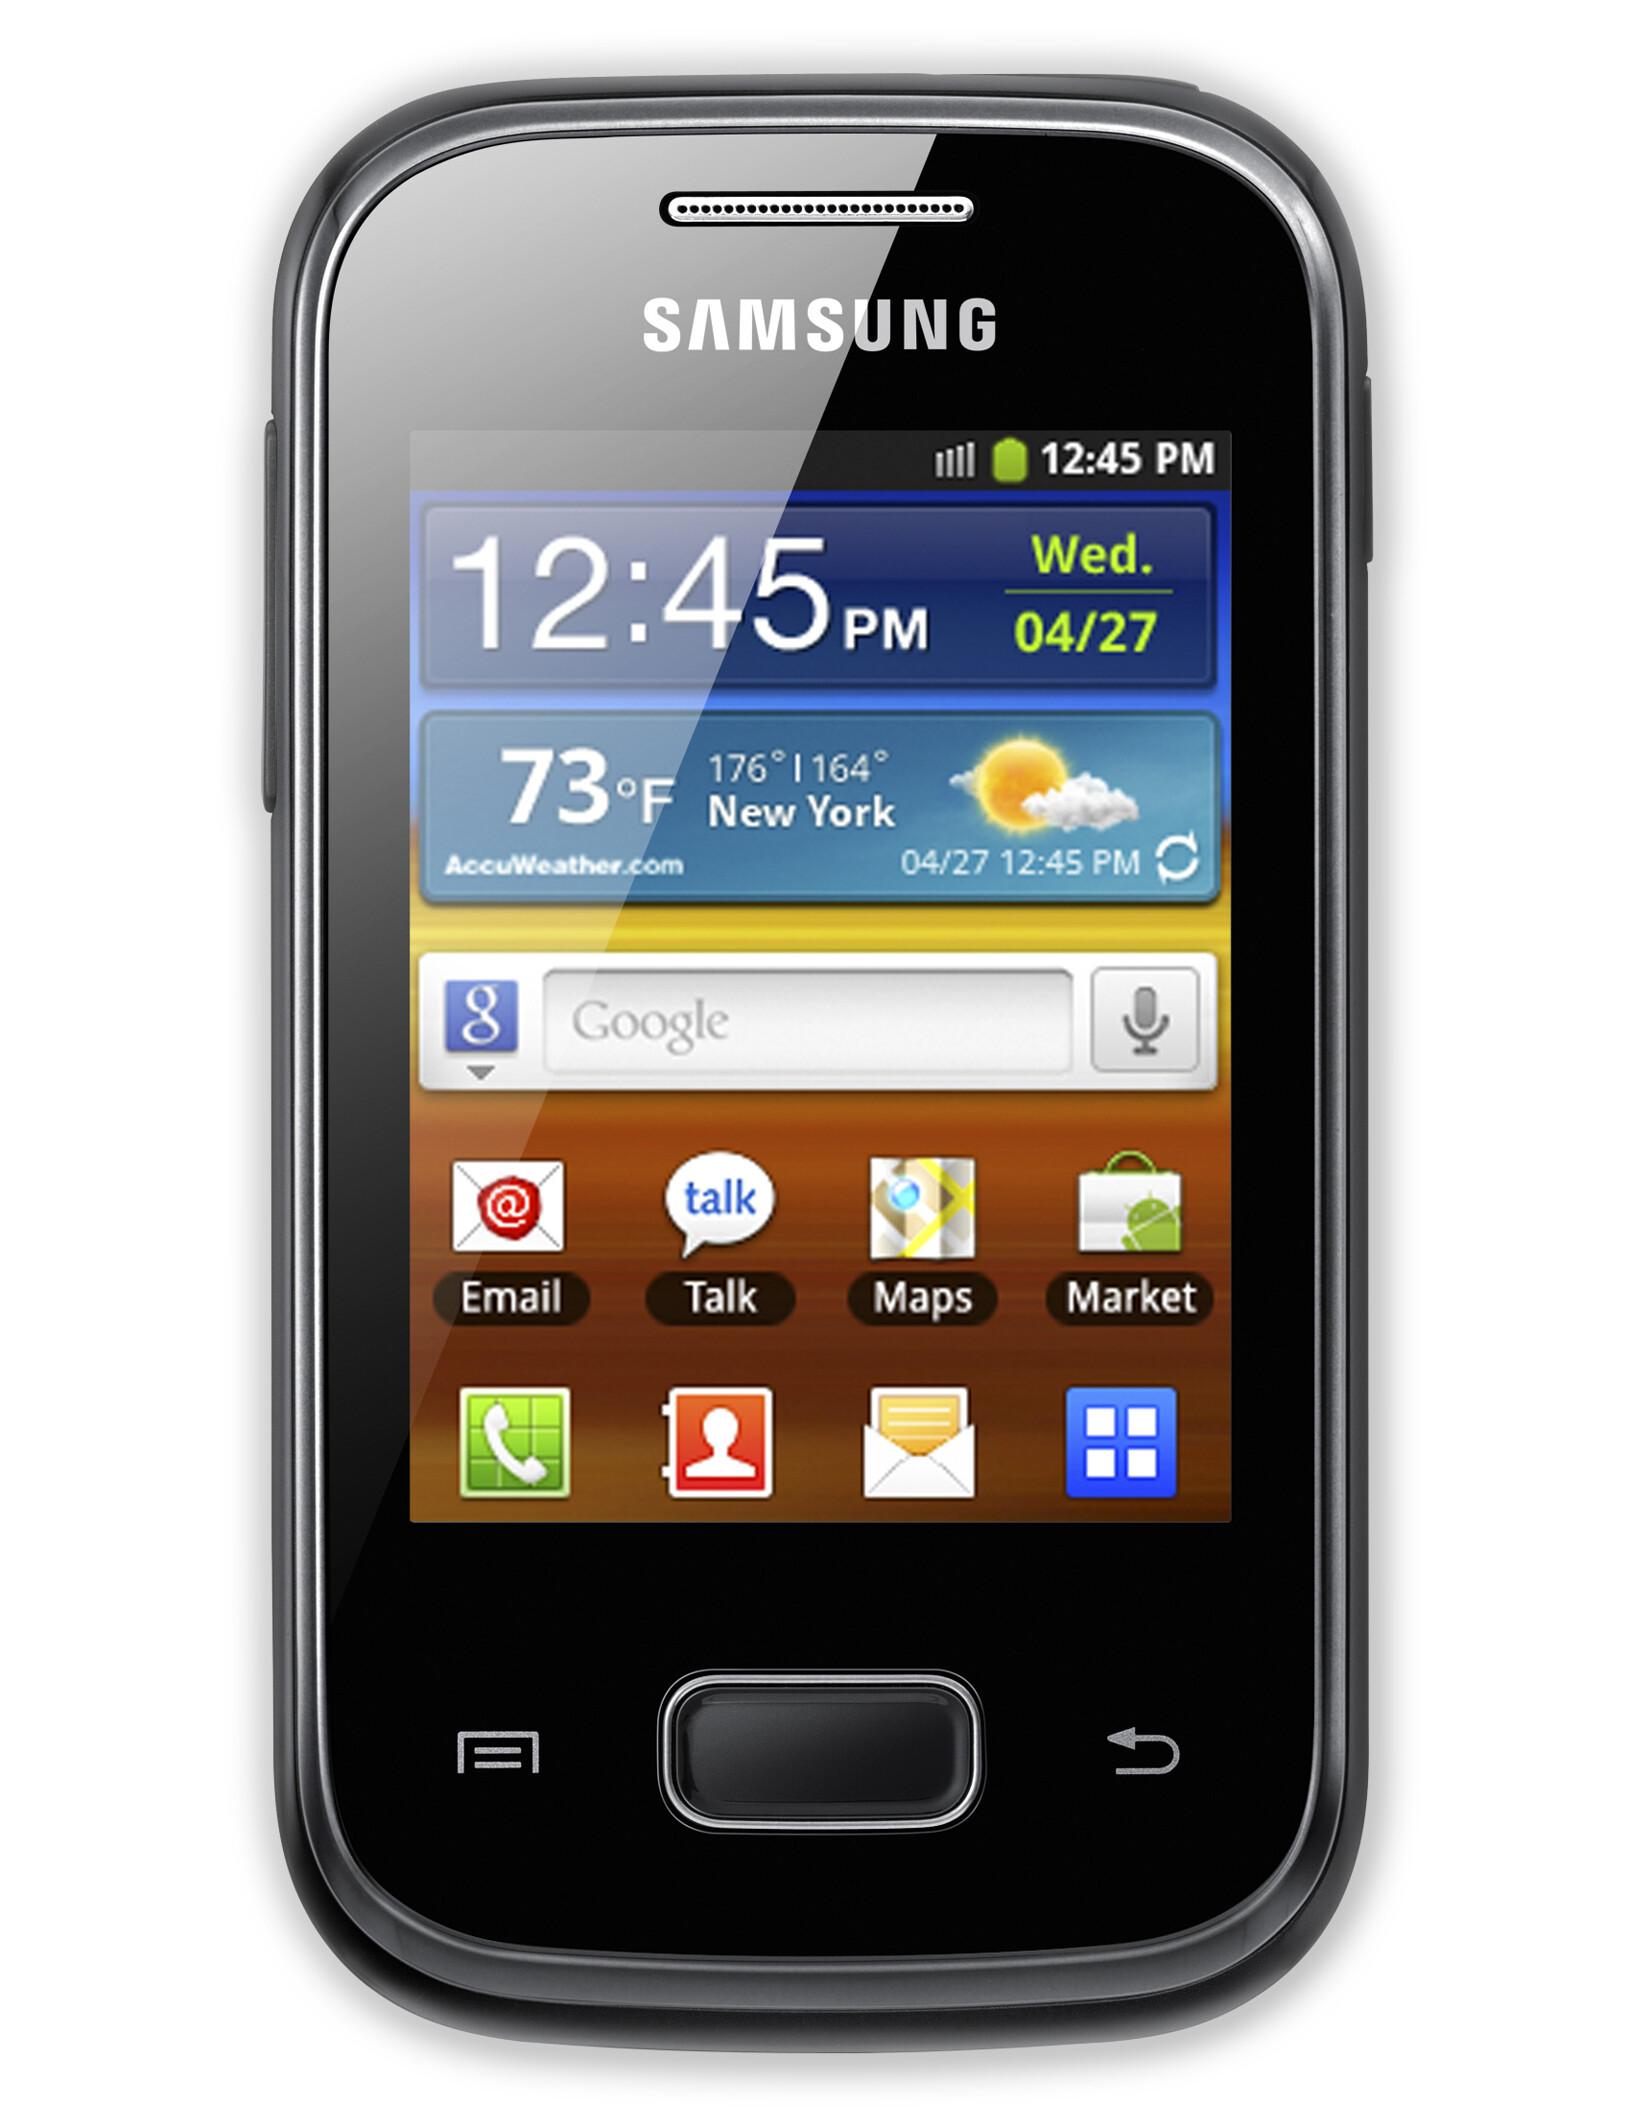 http://i-cdn.phonearena.com/images/phones/35234-xlarge/Samsung-Galaxy-Pocket-0.jpg